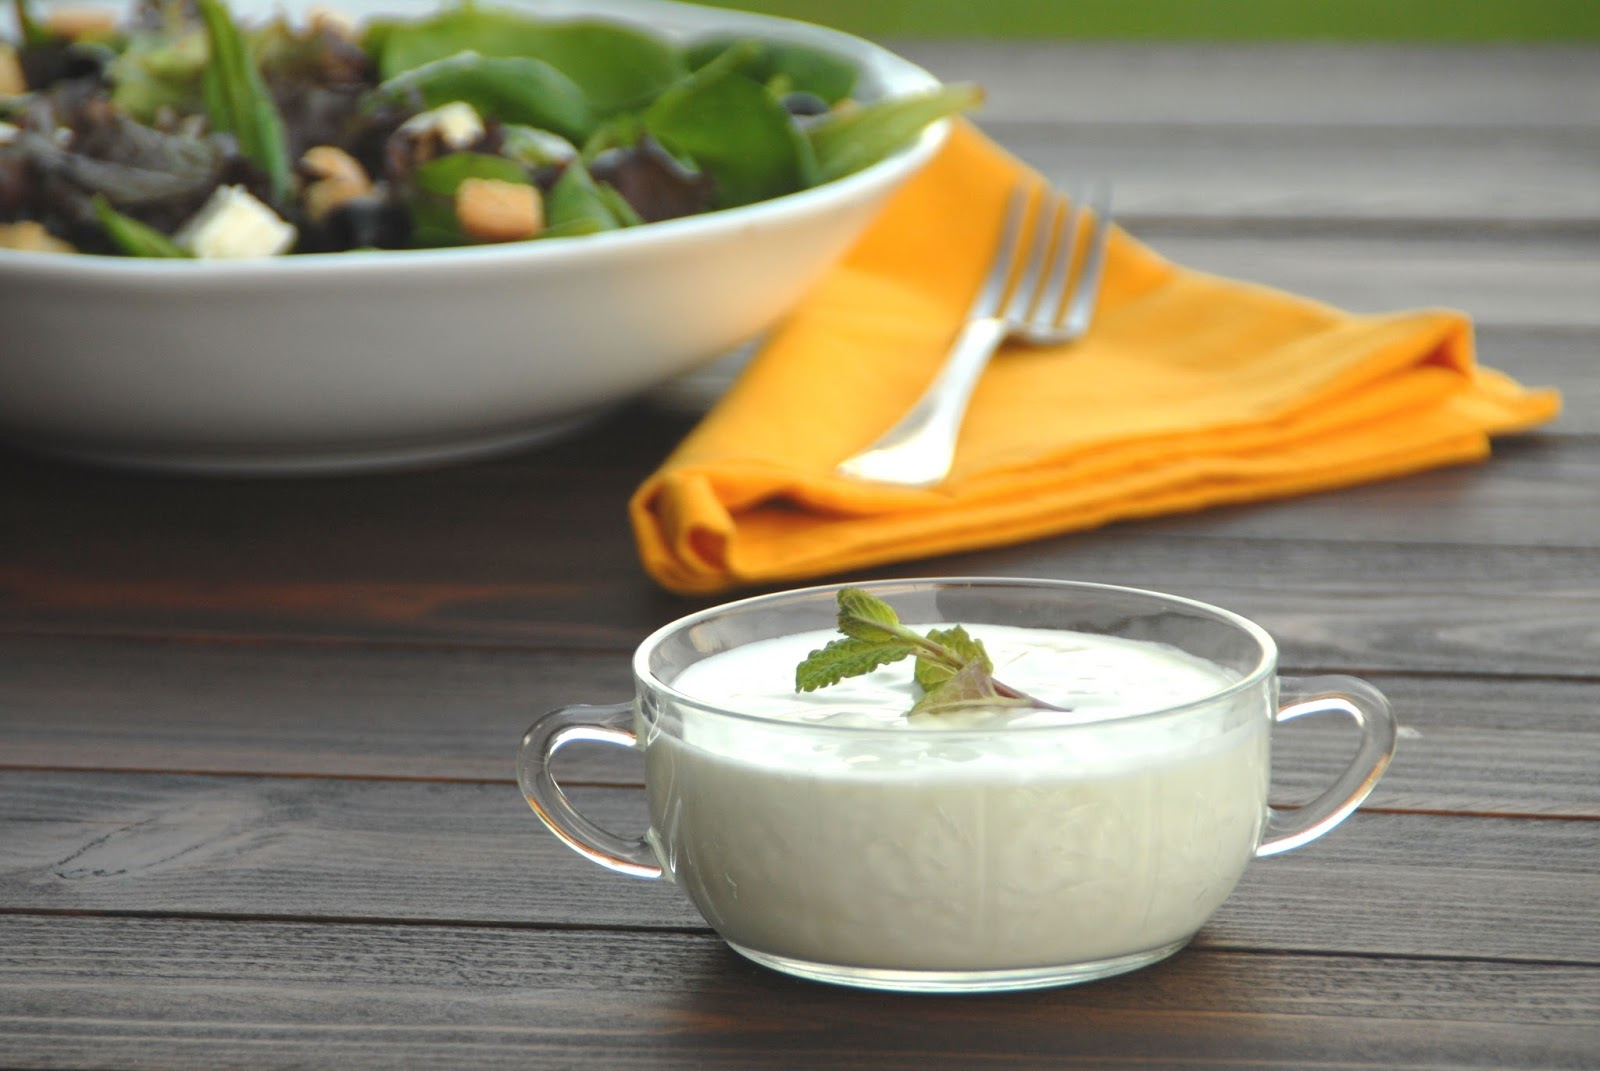 Ensalada receta salsa yogur